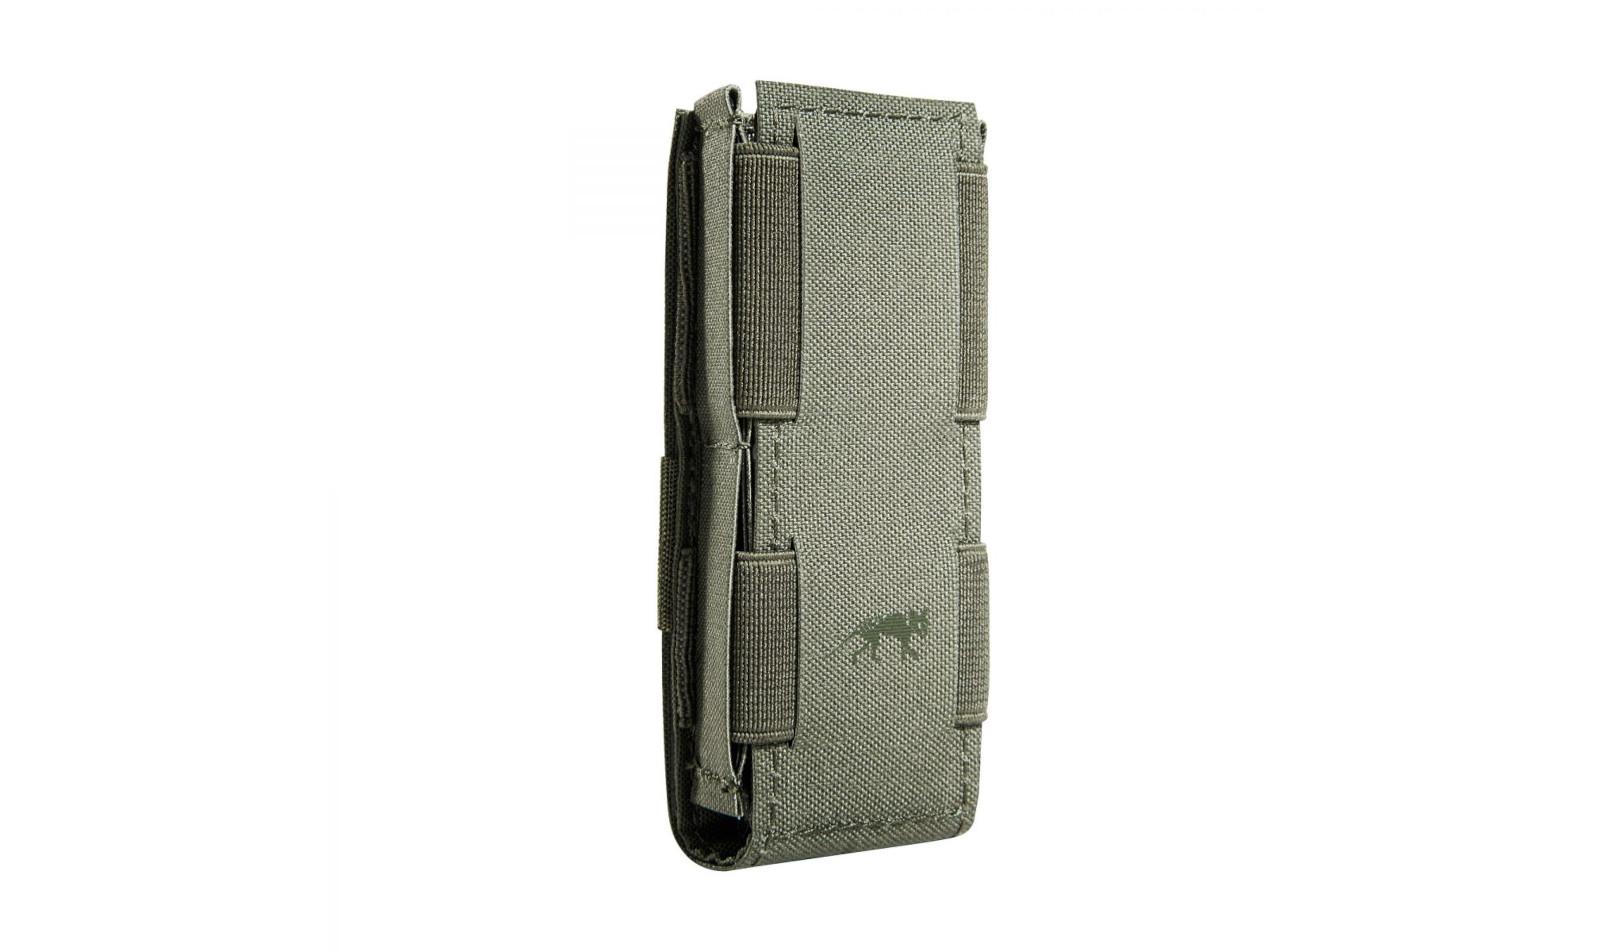 7084332 a TT SGL PISTOL MAG POUCH MCL L IRR